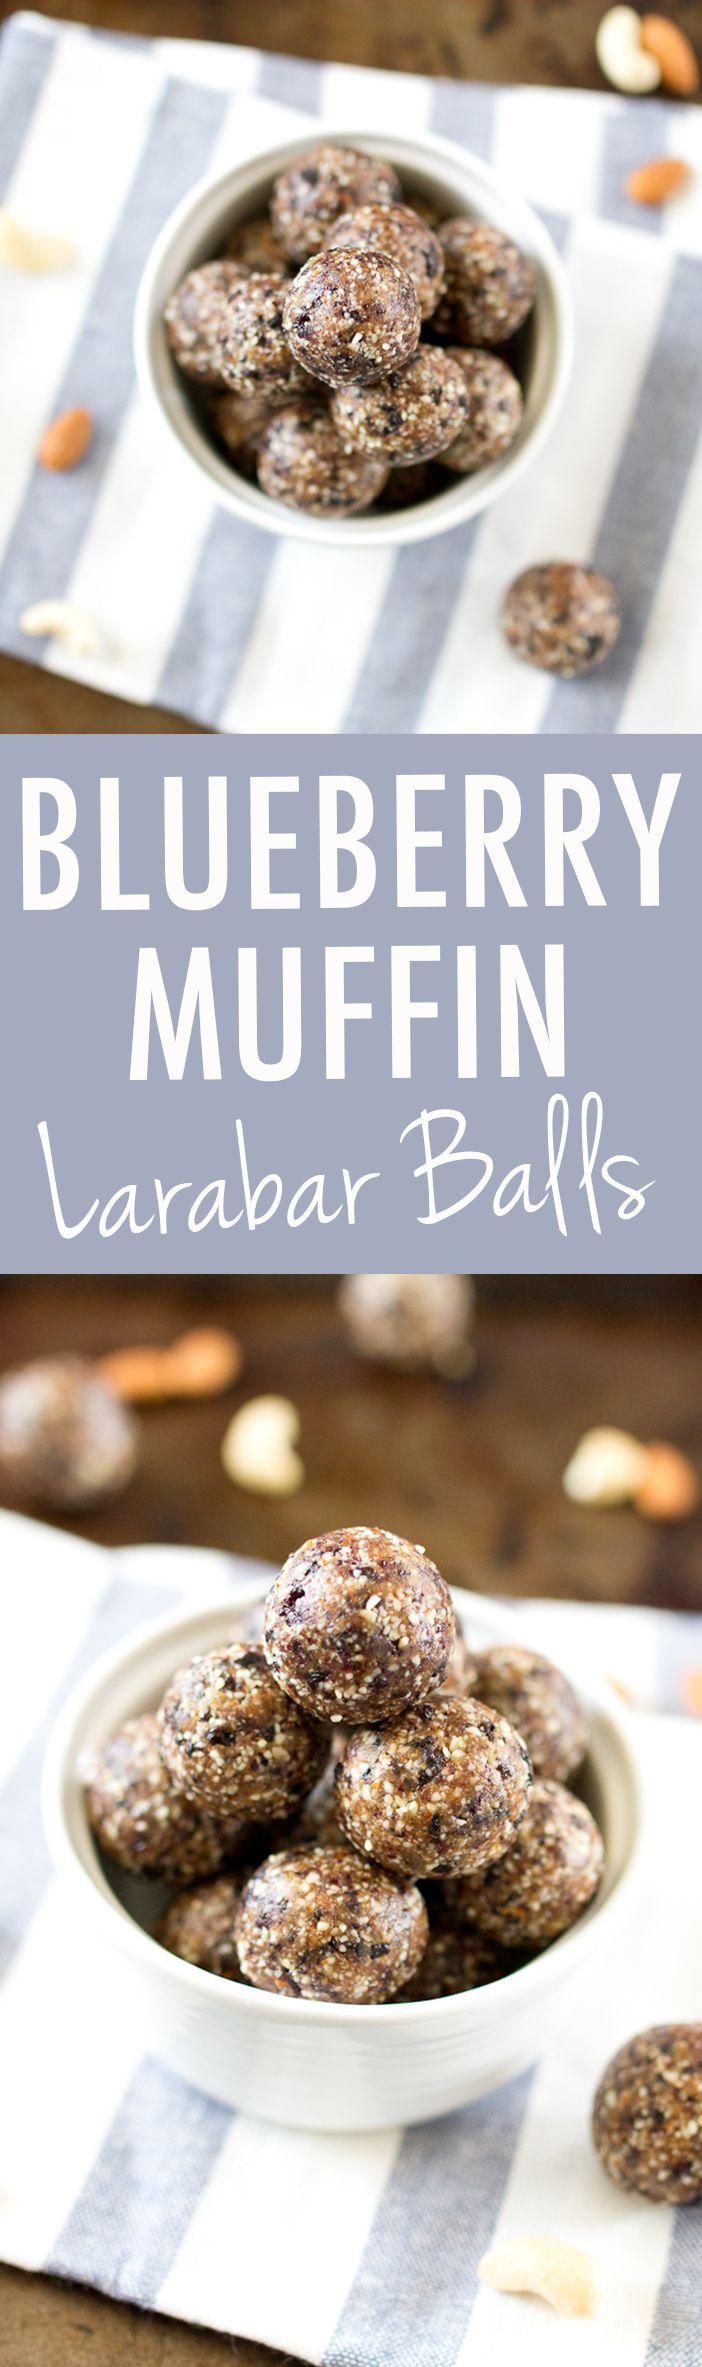 Muffins op Pinterest - Bosbessen Muffin Recepten, Muffins en Bosbessen ...